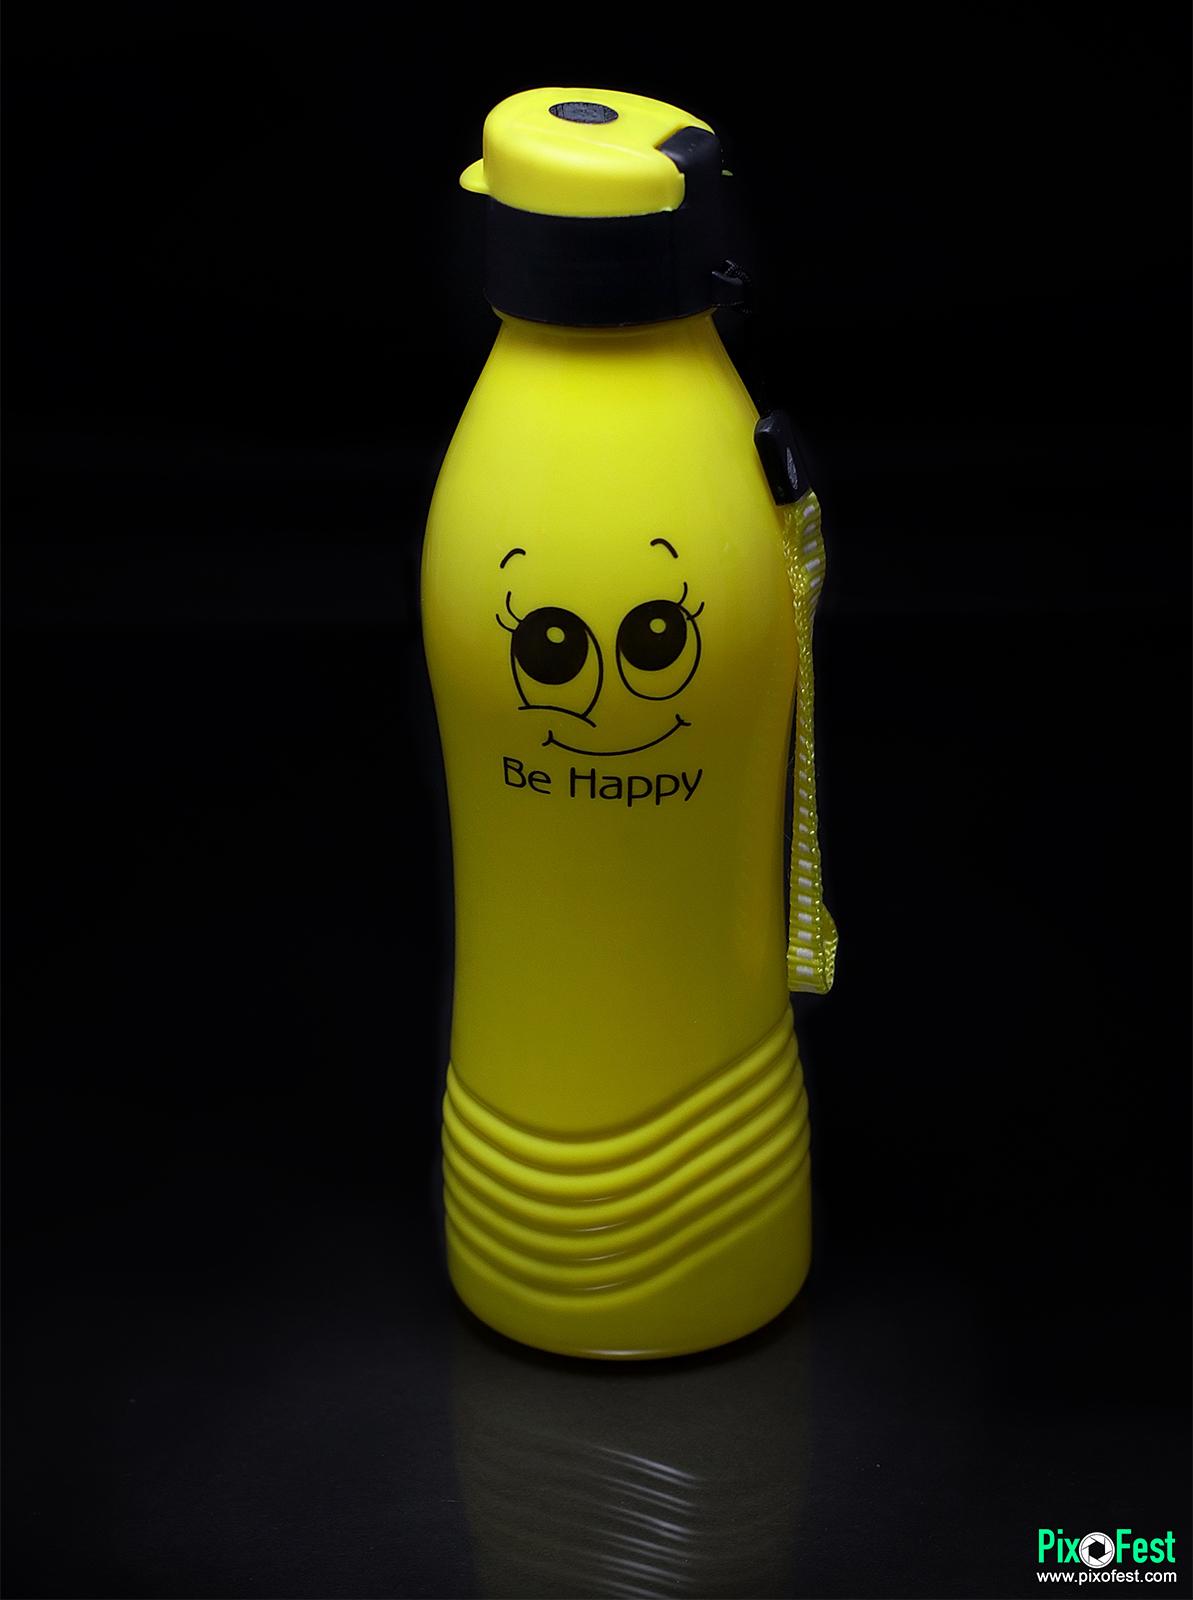 bottlesmile,waterbottlecopper,smileybottle,waterbottlebrands,waterbottlehydroflask,sportswaterbottles,waterbottle,productphotographyideas,kolkatafatafat,photography,1litrewaterbottle,productphotoshoot,behappy,dontworrybehappy,behappyquotes,behappystatus,pixofest